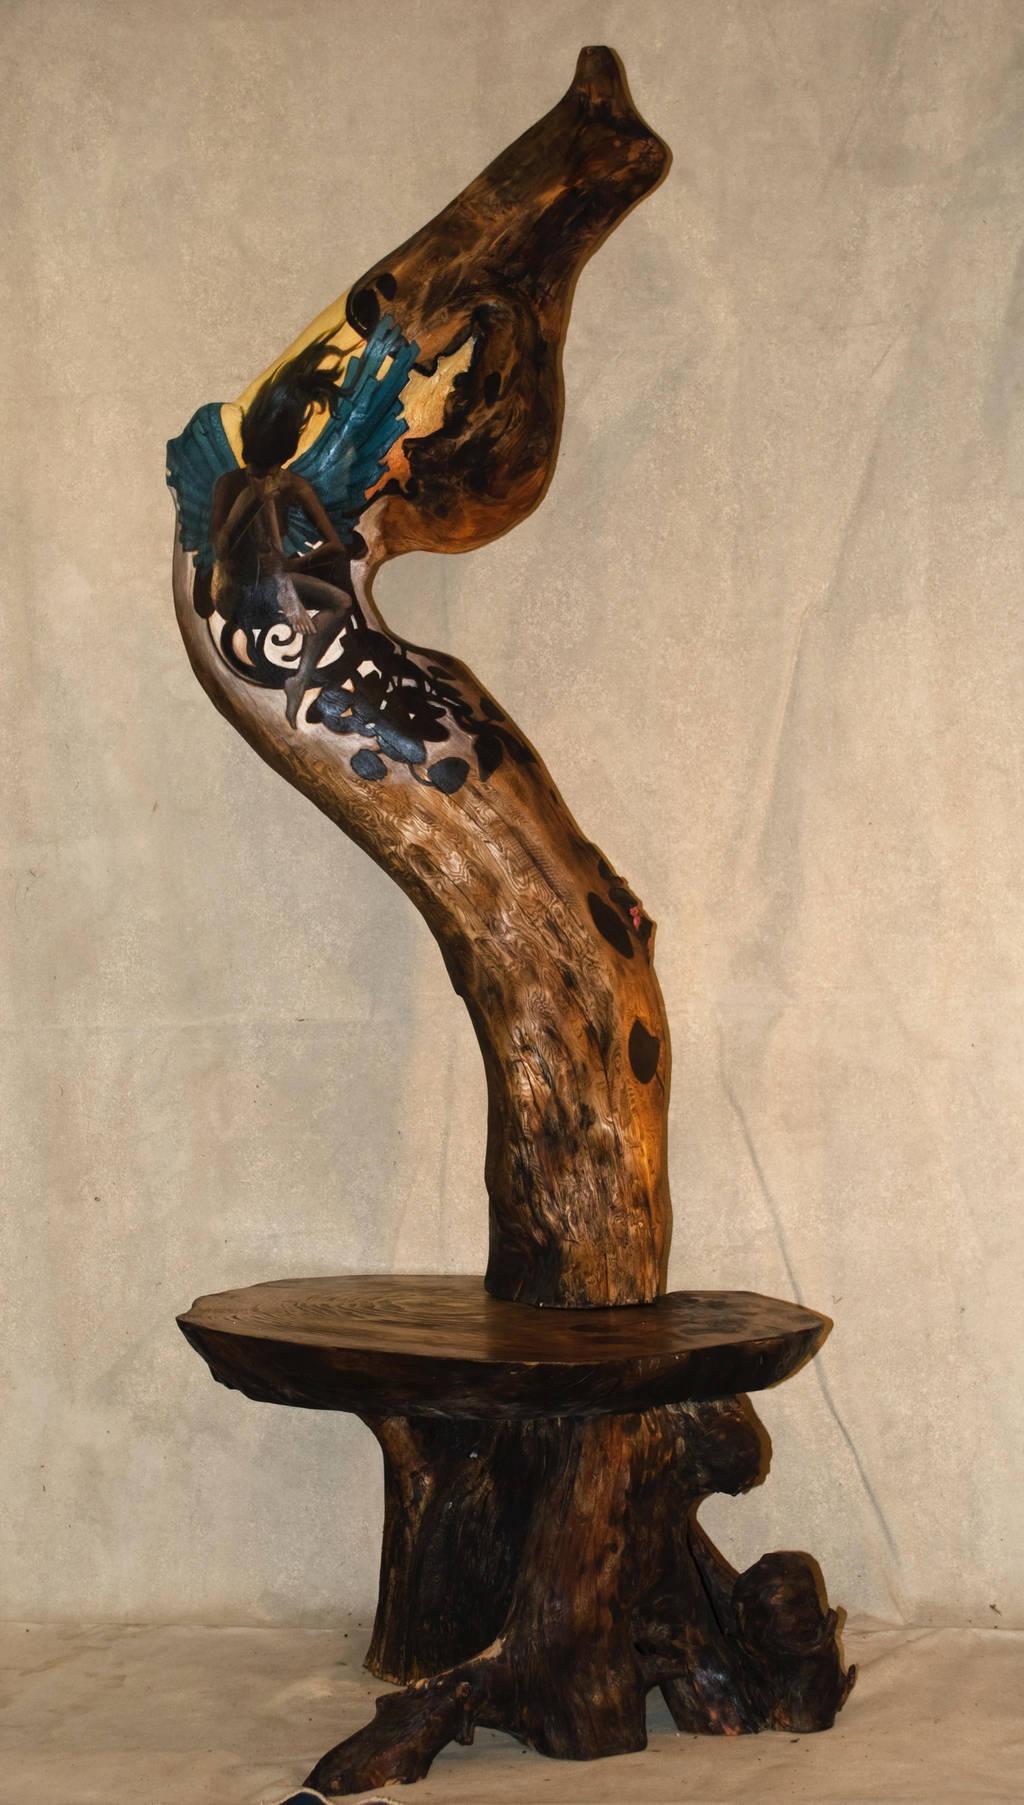 Wood spirit coffee table by N8grafica